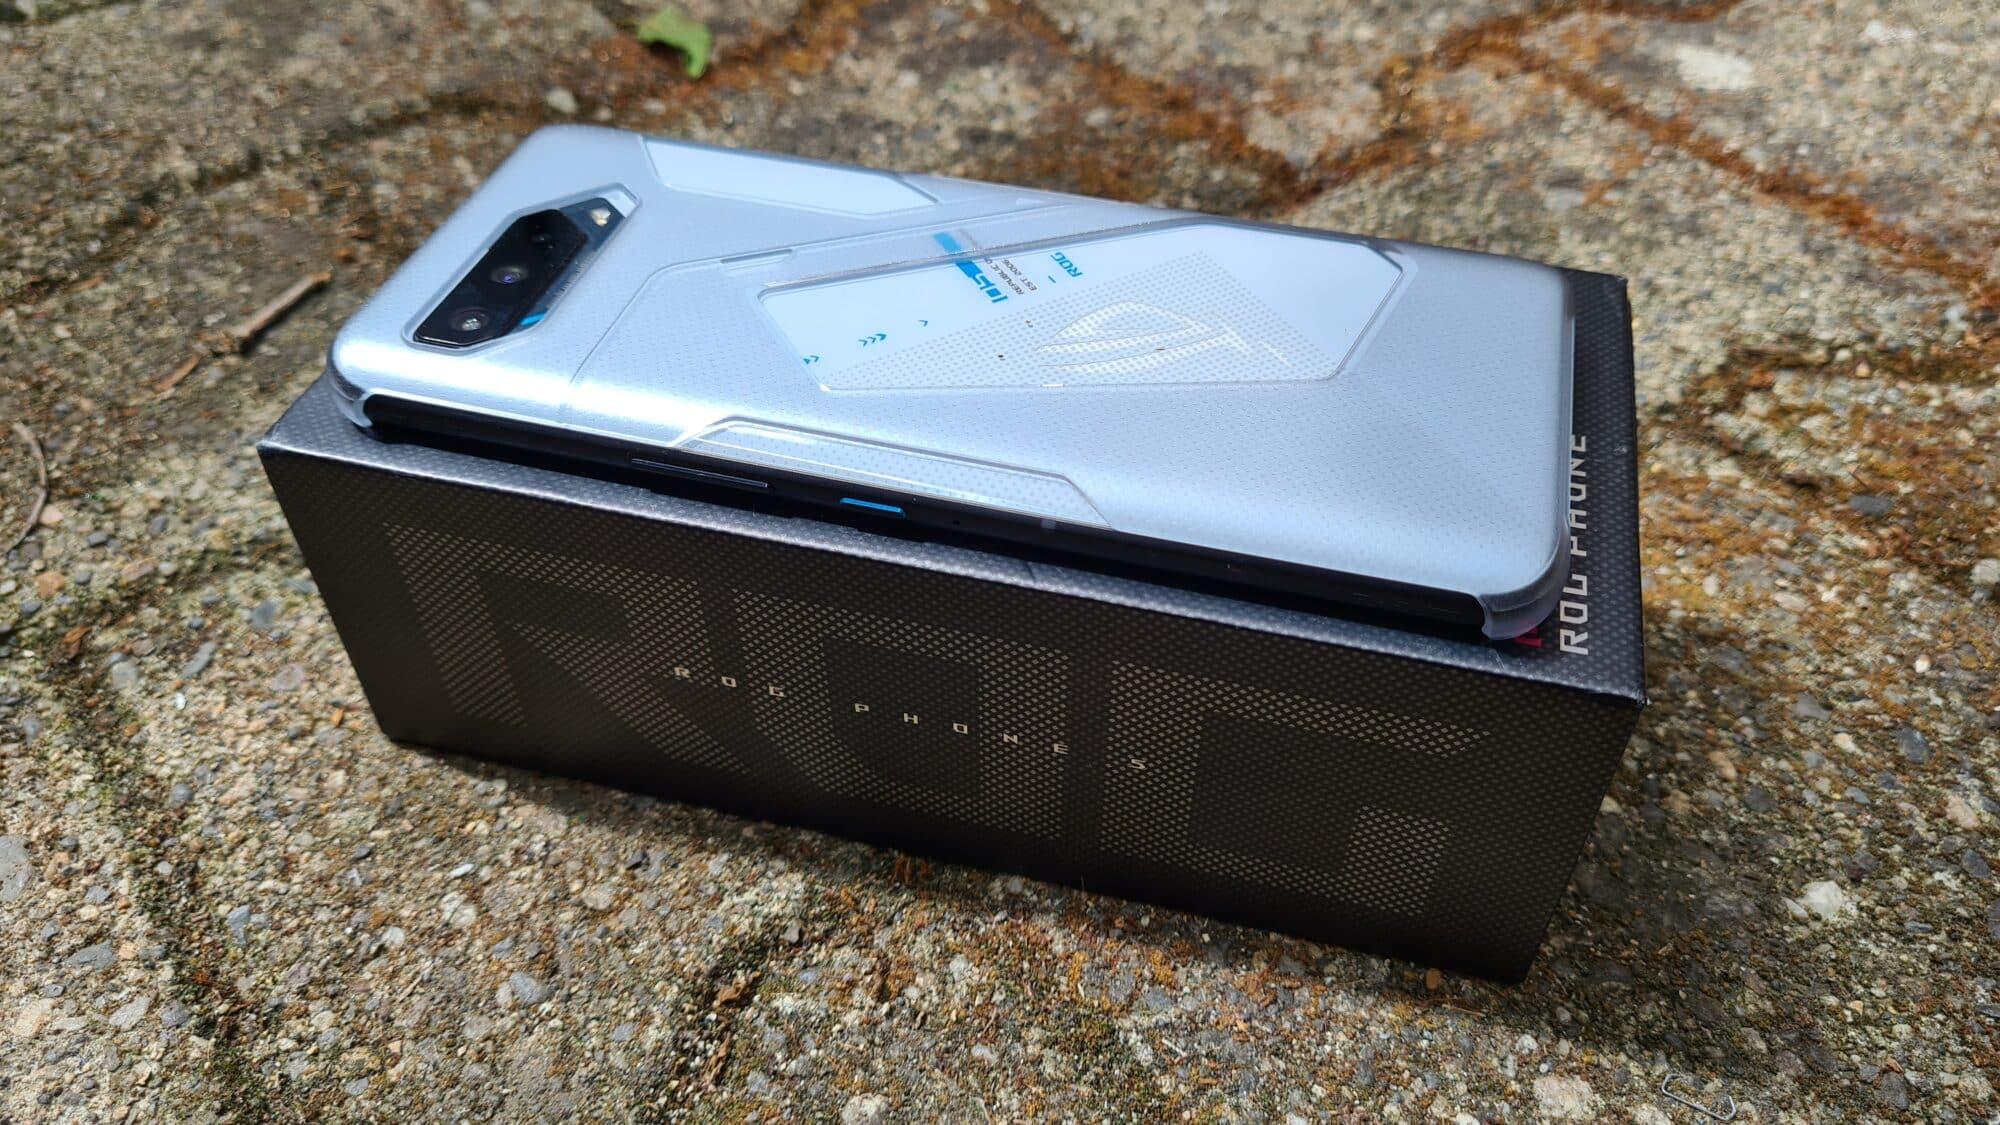 Rog Phone 5 - Introduction